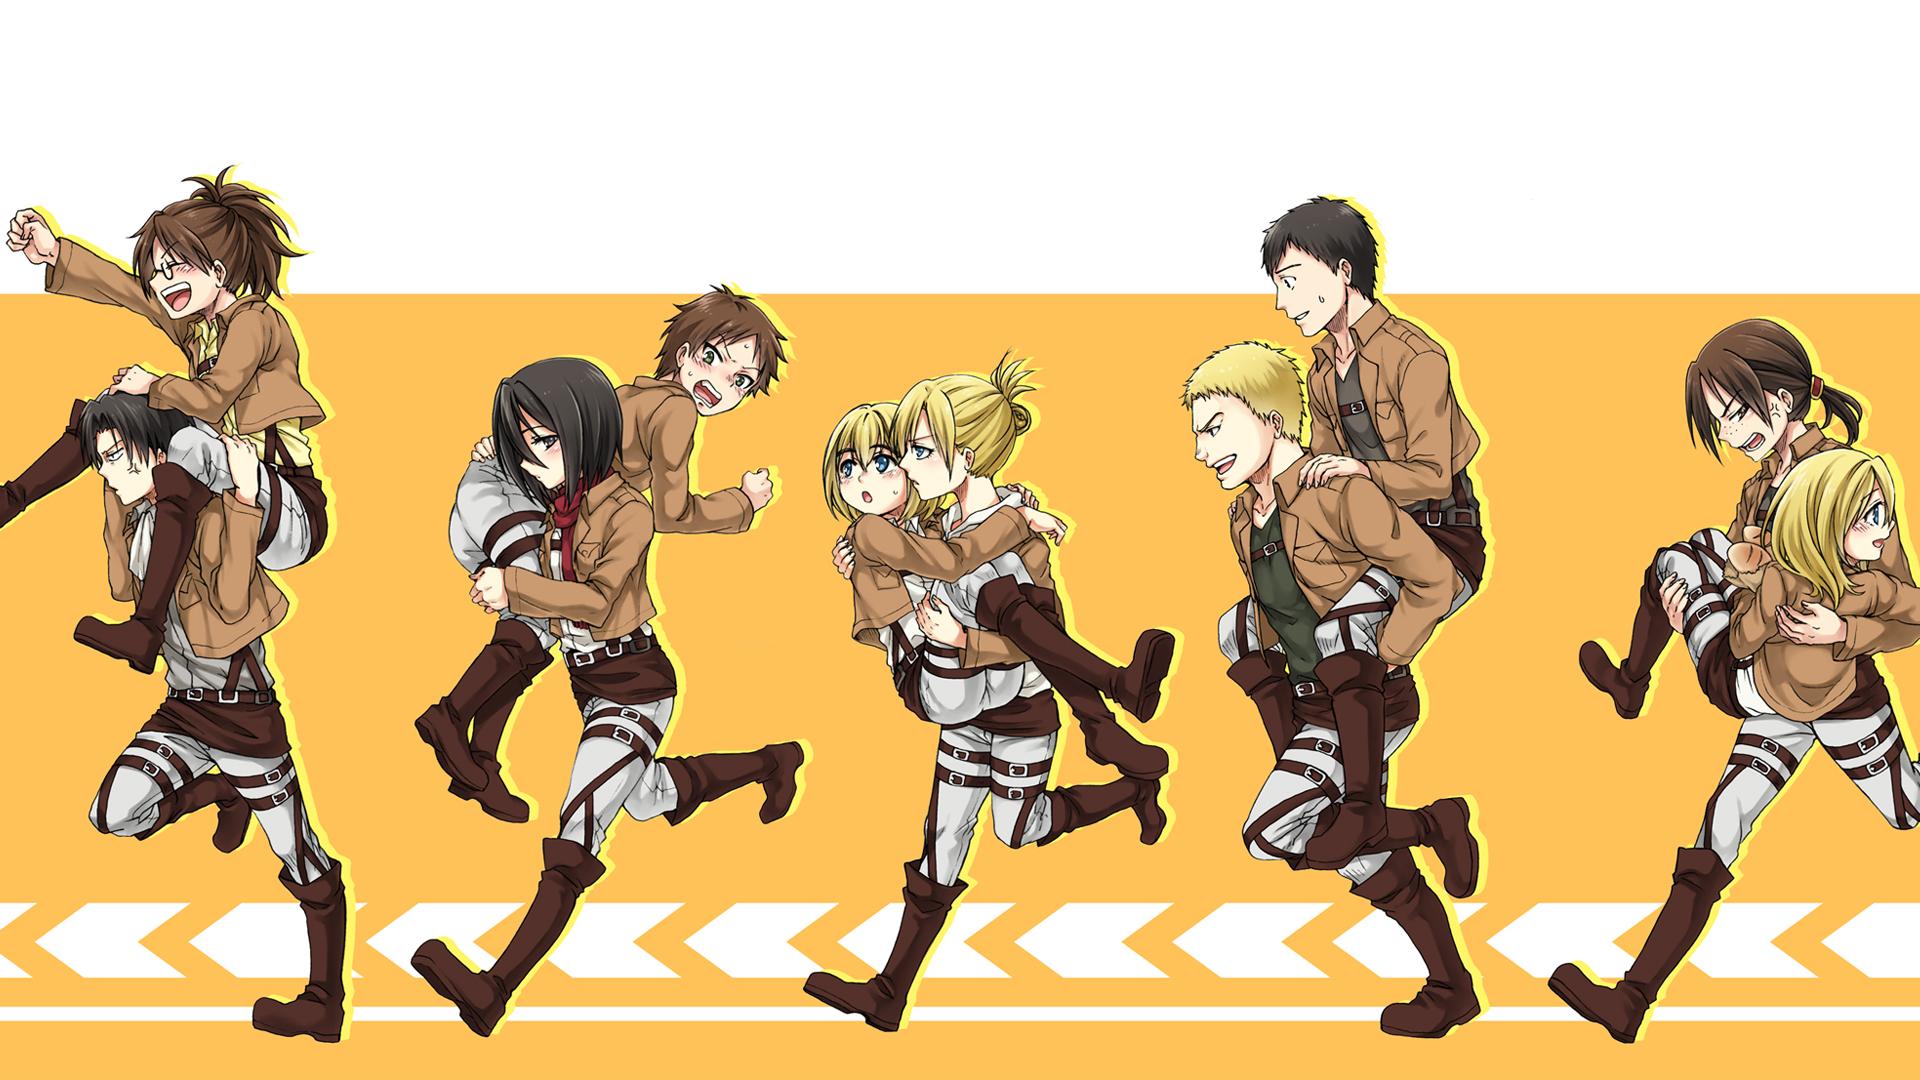 Anime - Attack On Titan  Shingeki No Kyojin Historia Reiss Sasha Blouse Reiner Braun Bertolt Hoover Annie Leonhart Armin Arlert Levi Ackerman Hange Zoë Eren Yeager Mikasa Ackerman Wallpaper